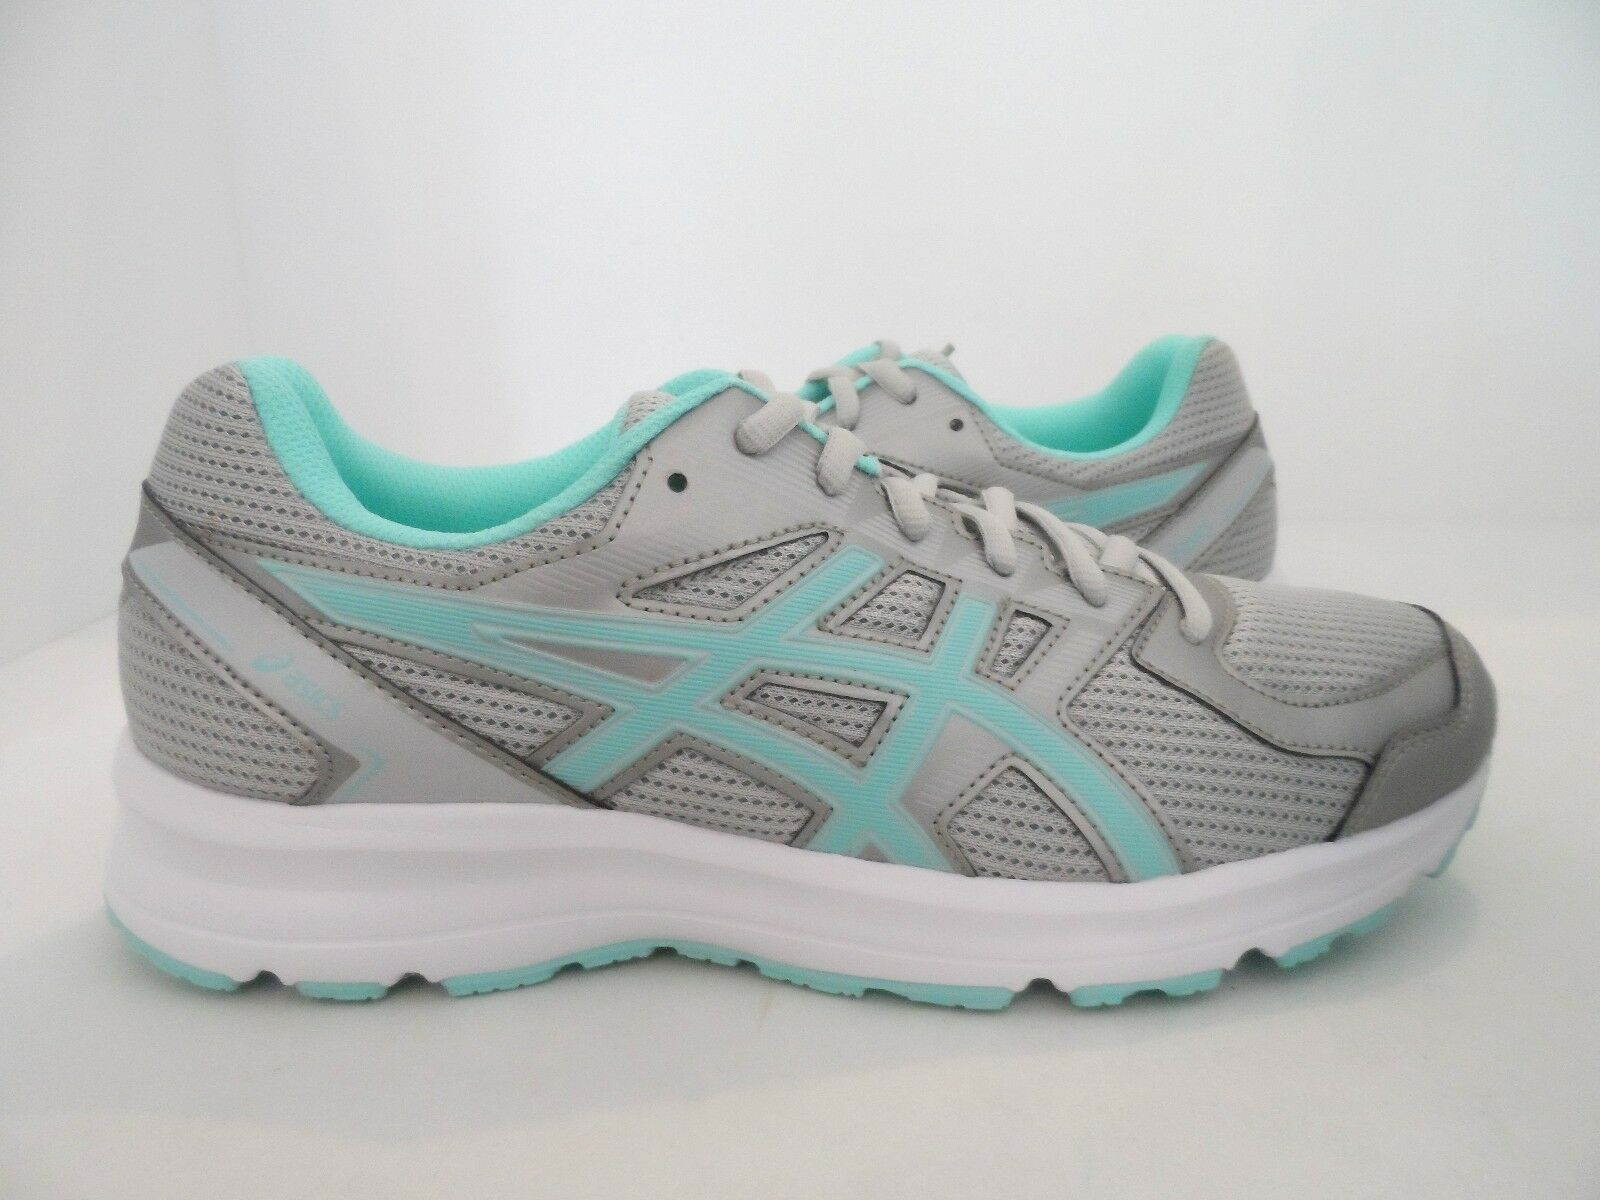 ASICS Women's Jolt Running shoes Glacier Grey Aqua Splash White Size 8.5 D